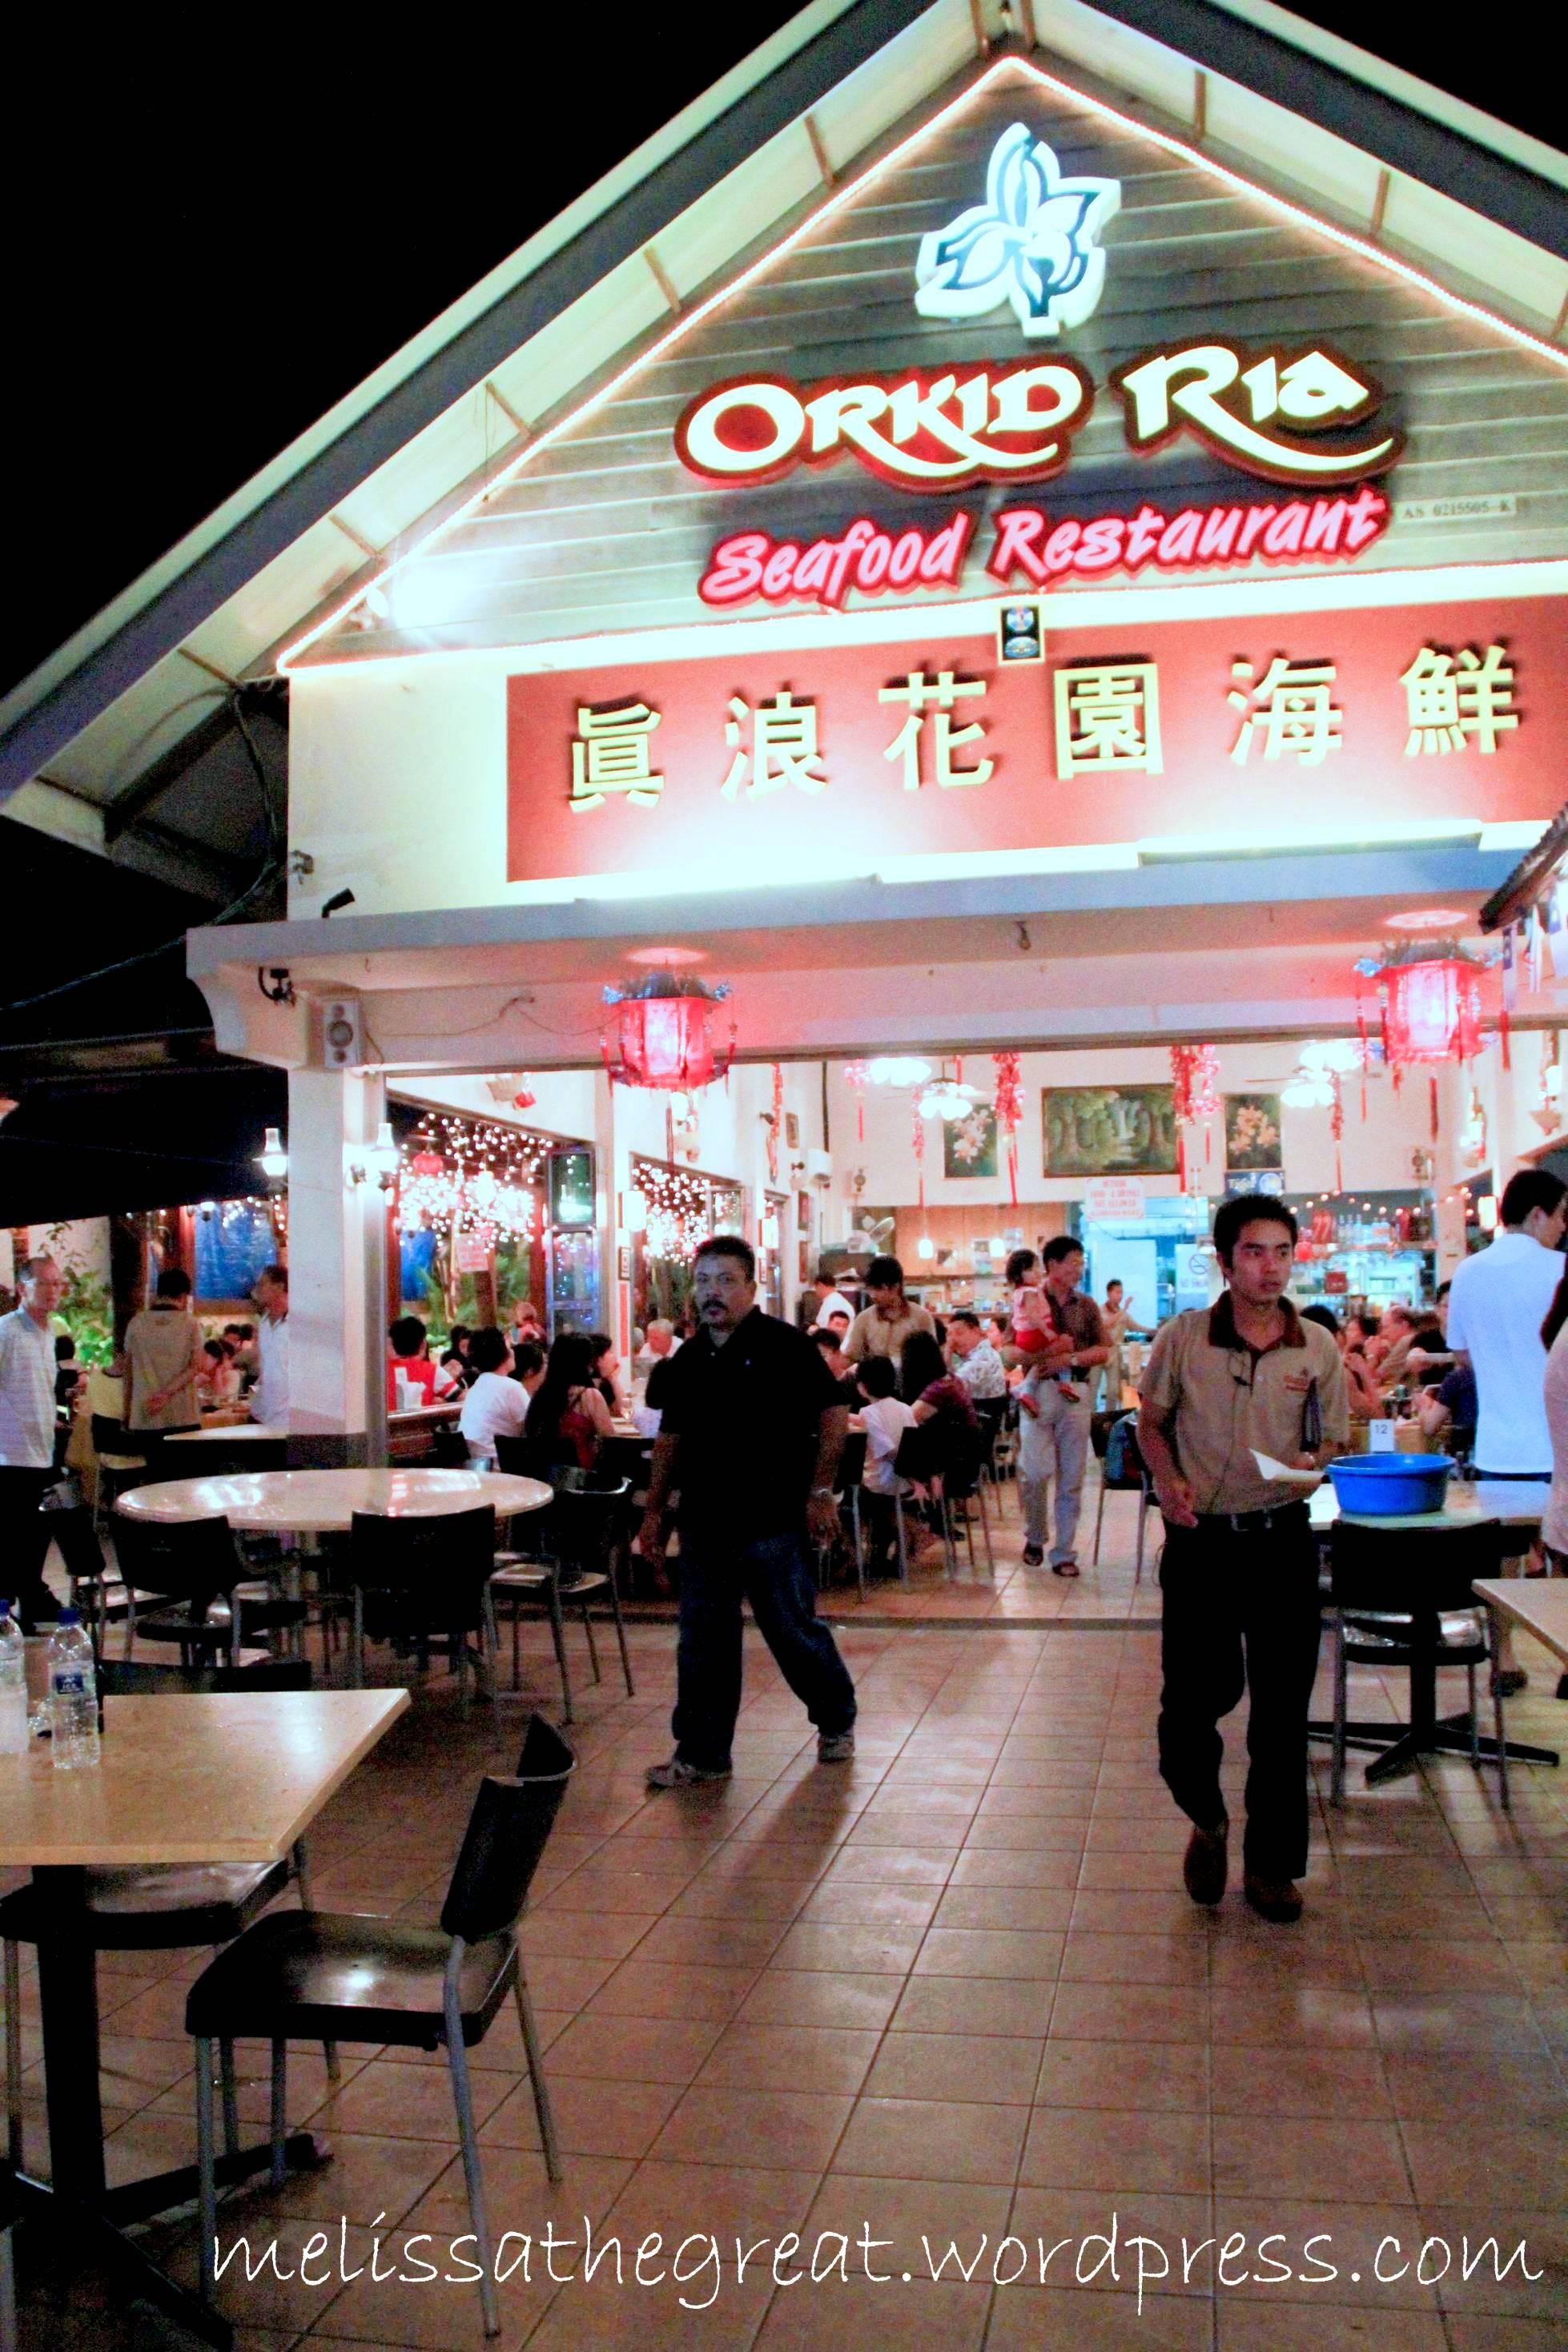 Orkid Ria Seafood Restaurant Halal